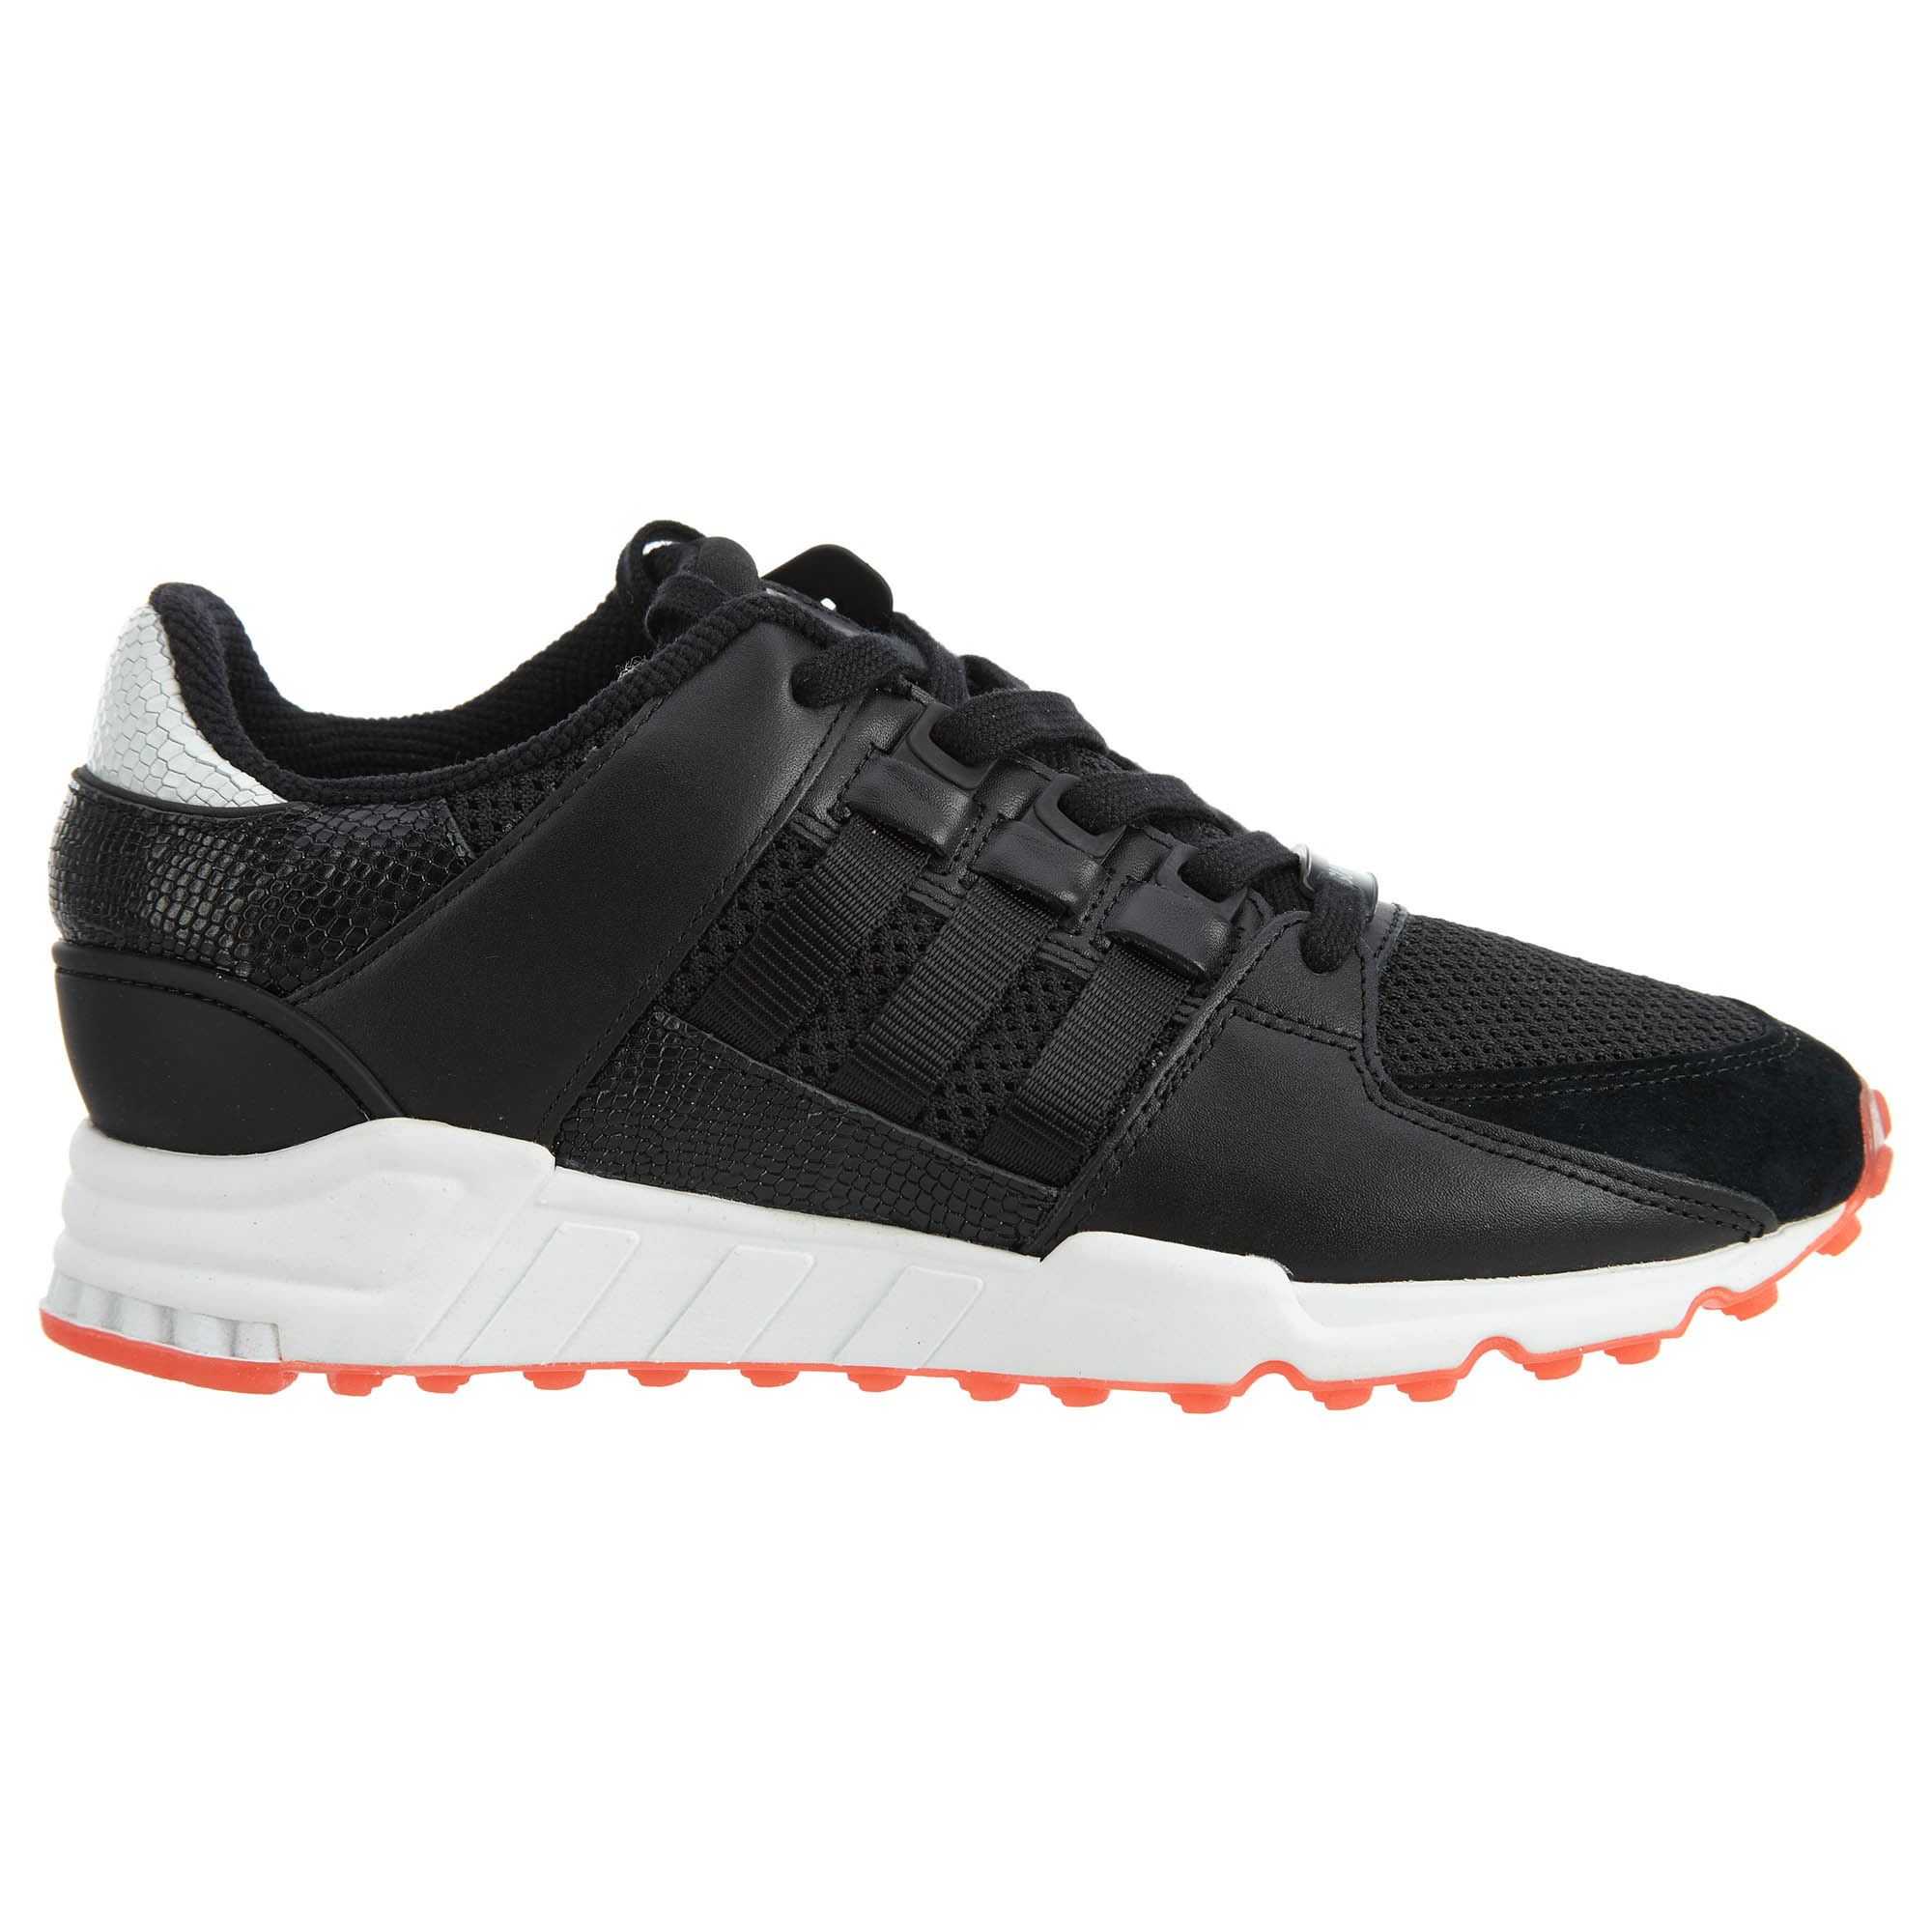 adidas Eqt Support Rf Black/Black-Turbo